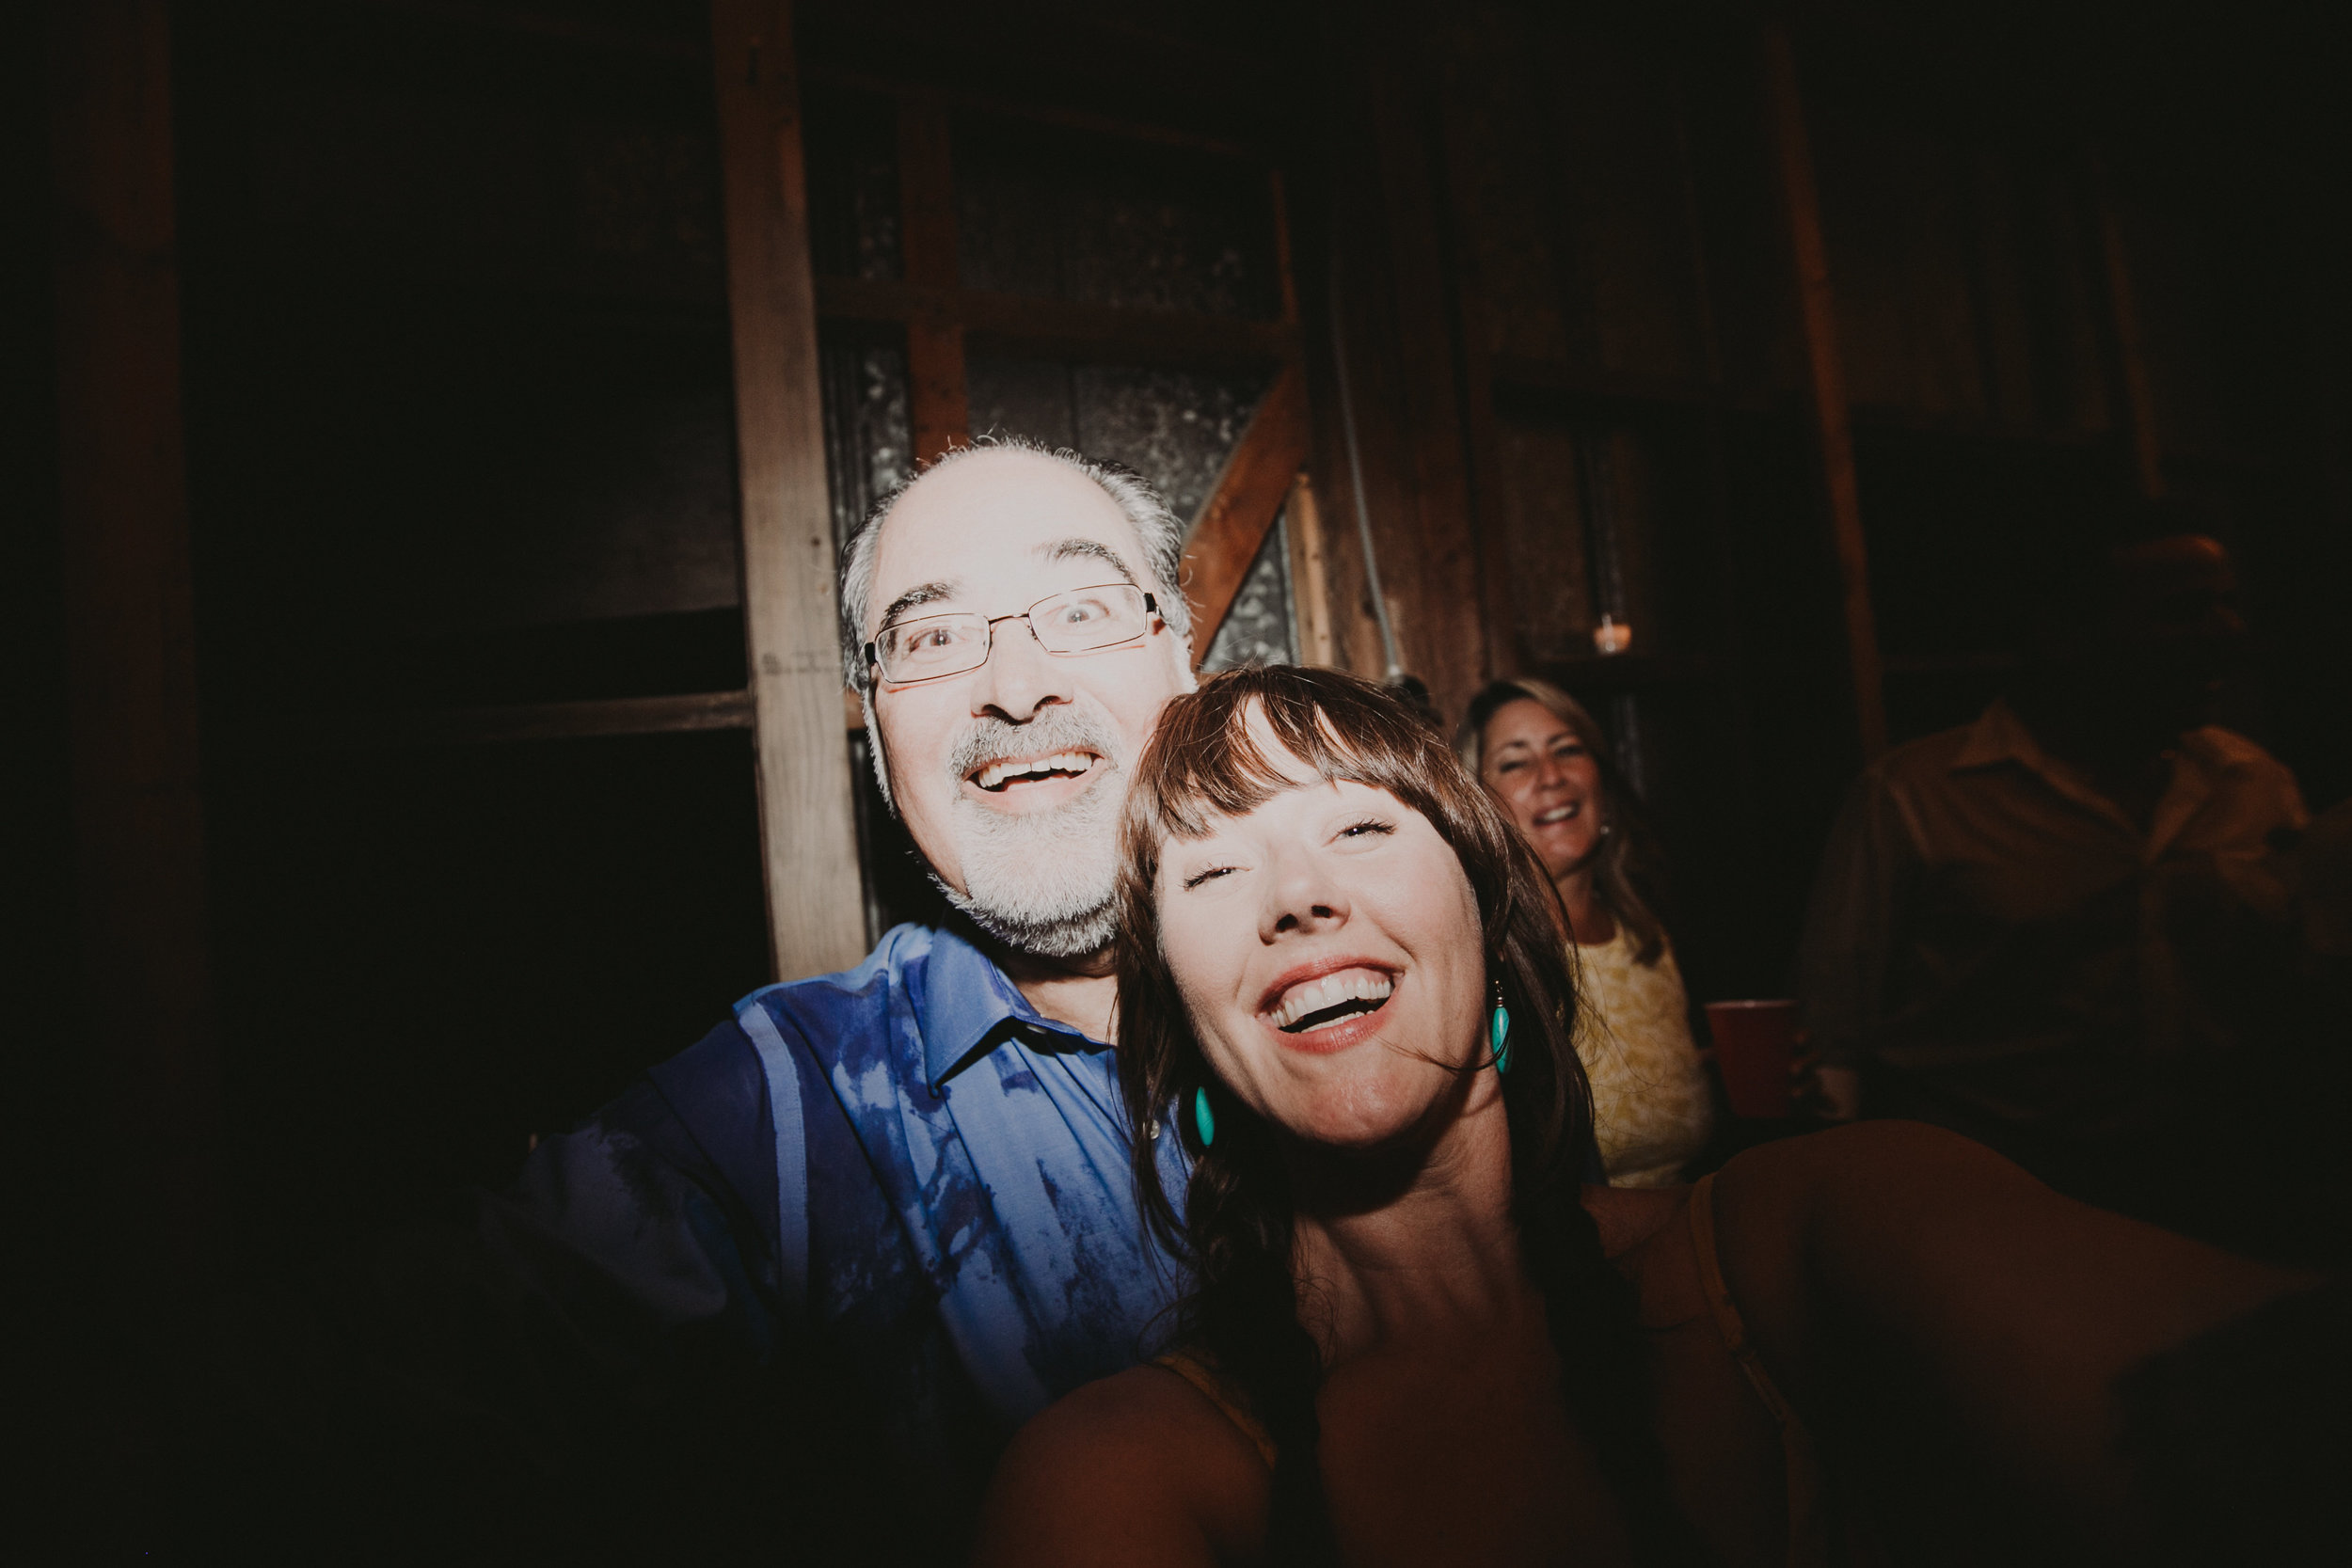 LIBERTY_VIEW_FARM_HIGHLAND_NY_WEDDING_CHELLISE_MICHAEL_PHOTOGRAPHY912.JPG